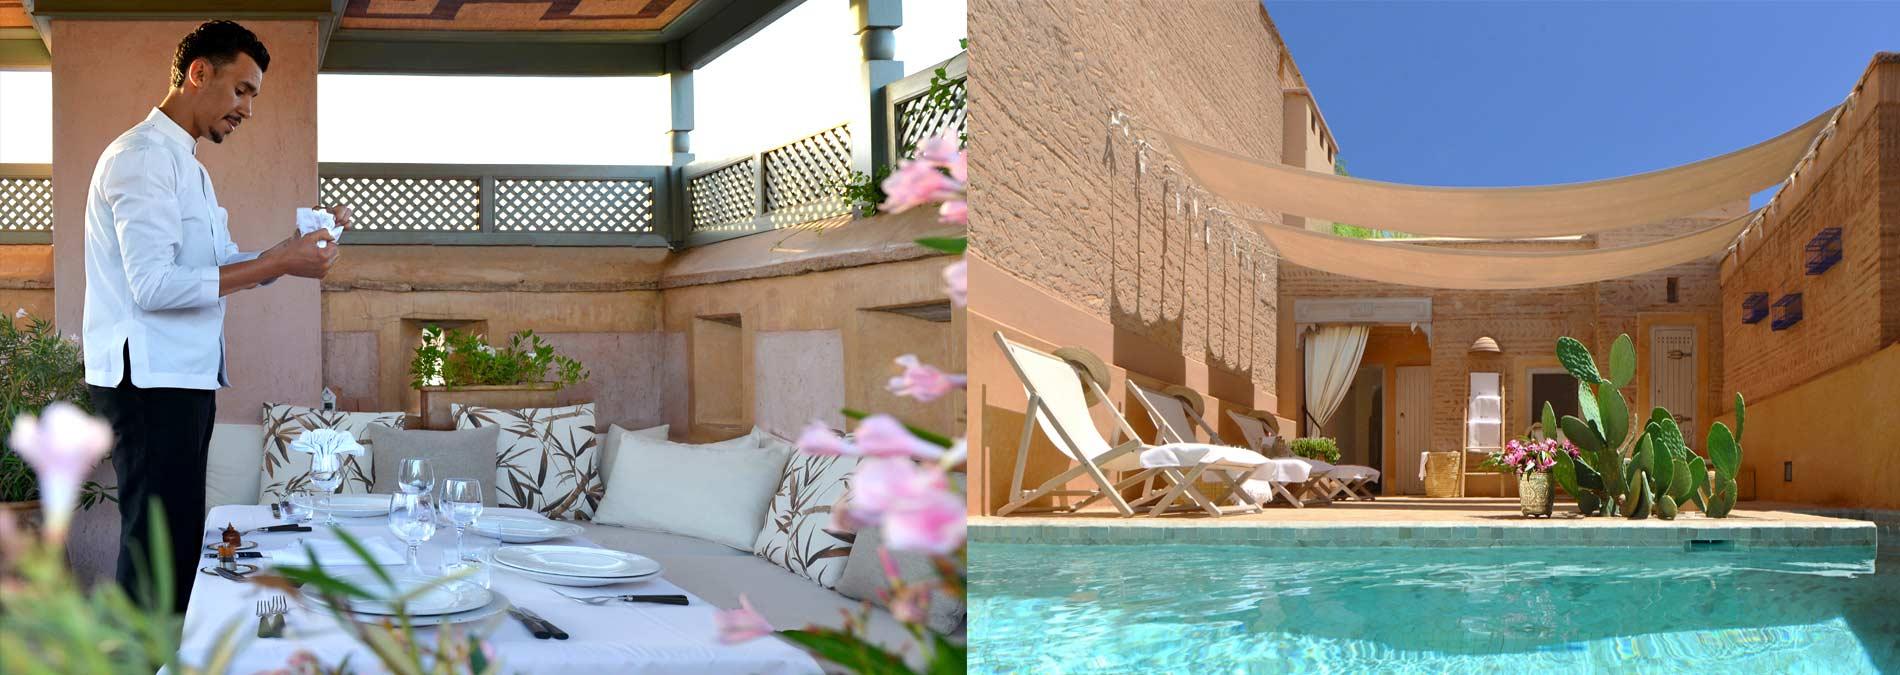 offre hôtel Dar Housnia à Marrakech